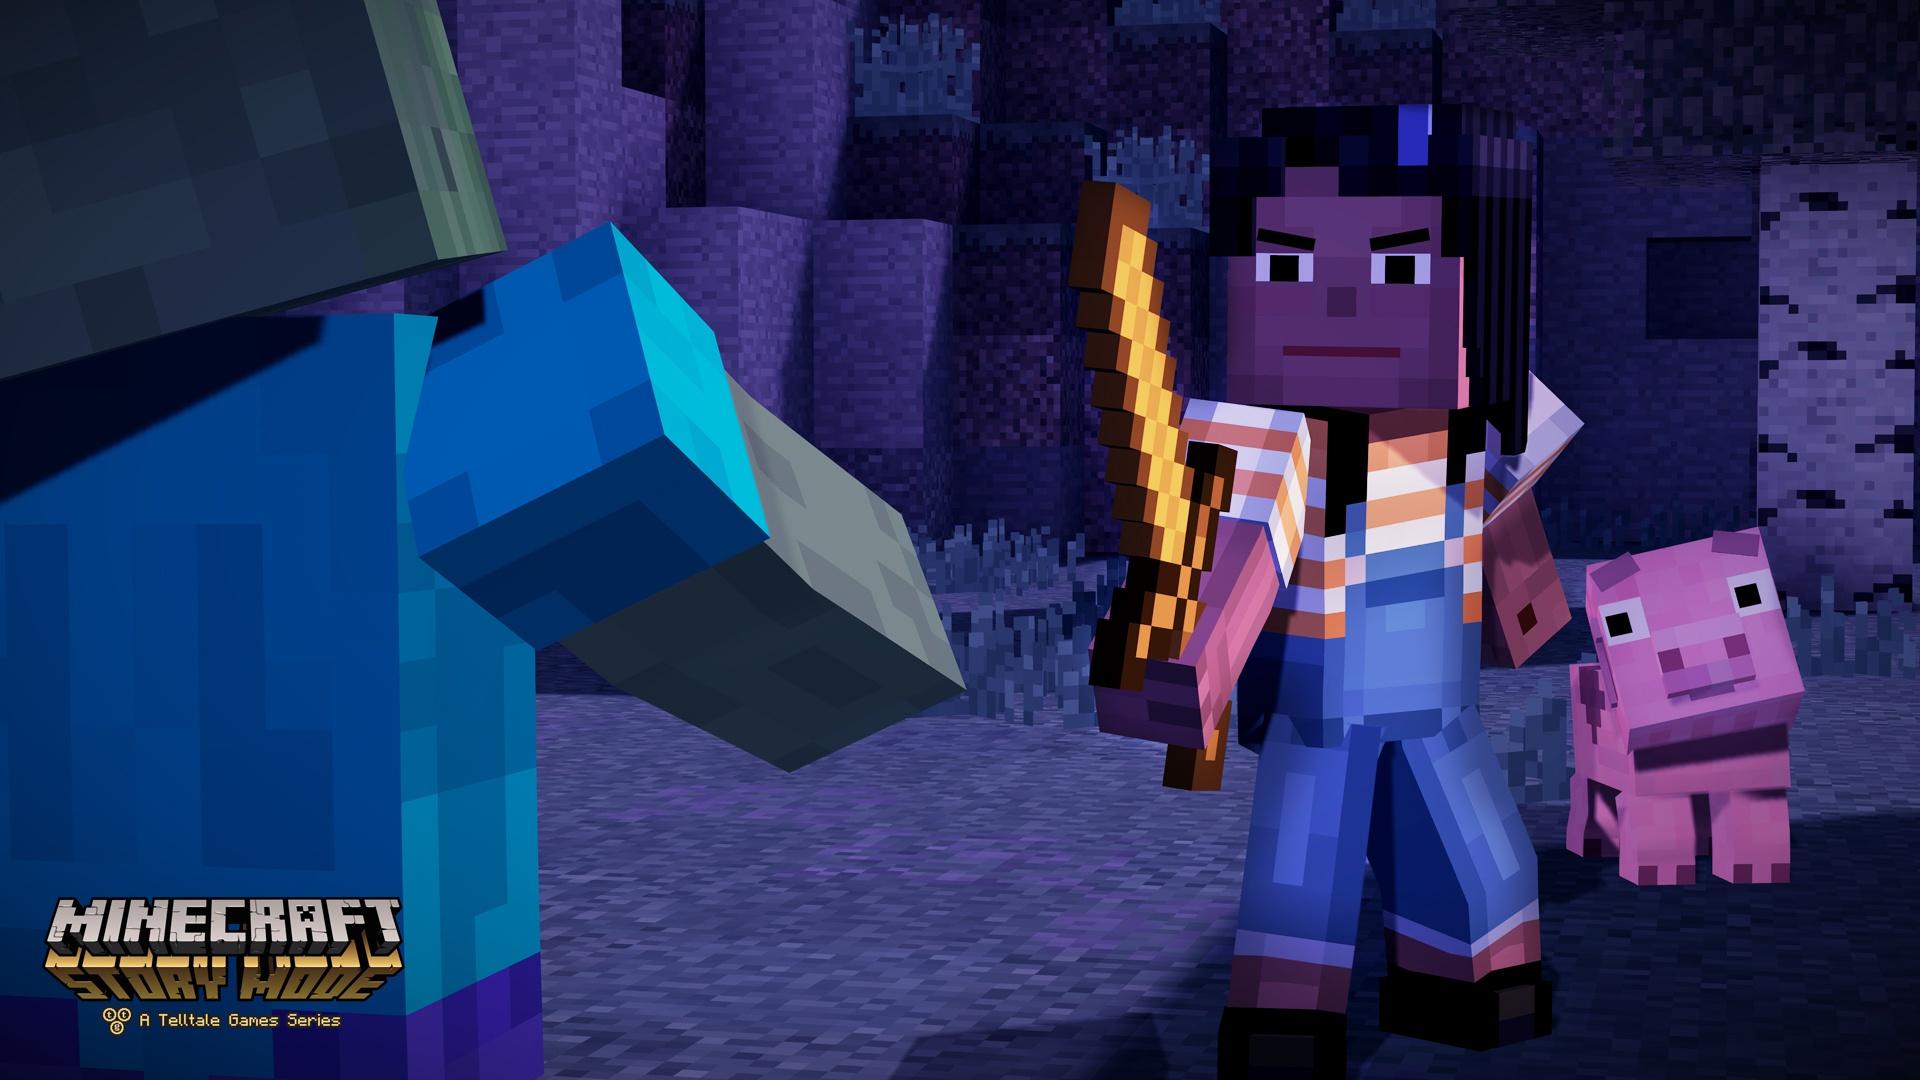 Minecraft Story Mode image #1